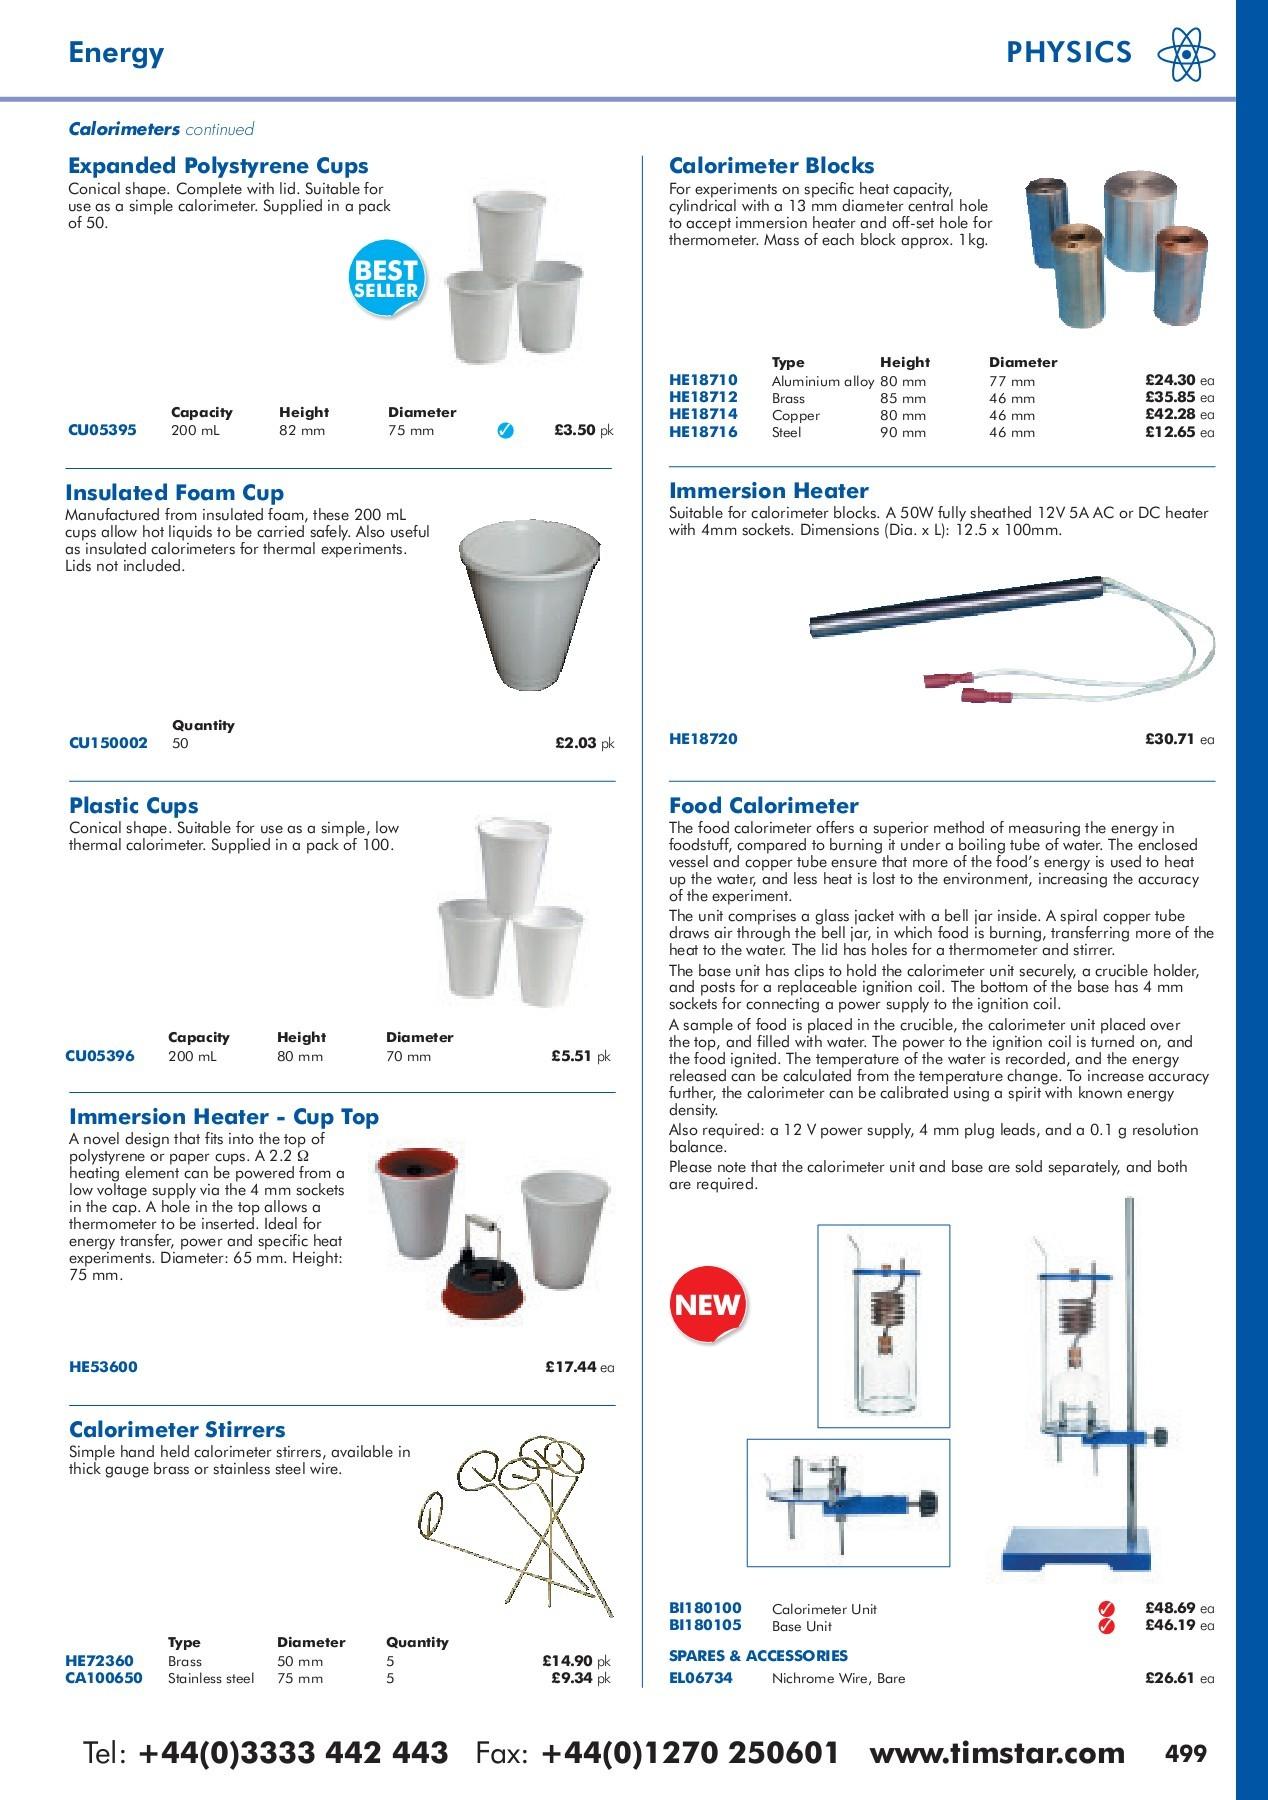 Catalogue Bi1 Beau Timstar International Catalogue 2018 19 Pages 501 550 Of 30 Beau Catalogue Bi1